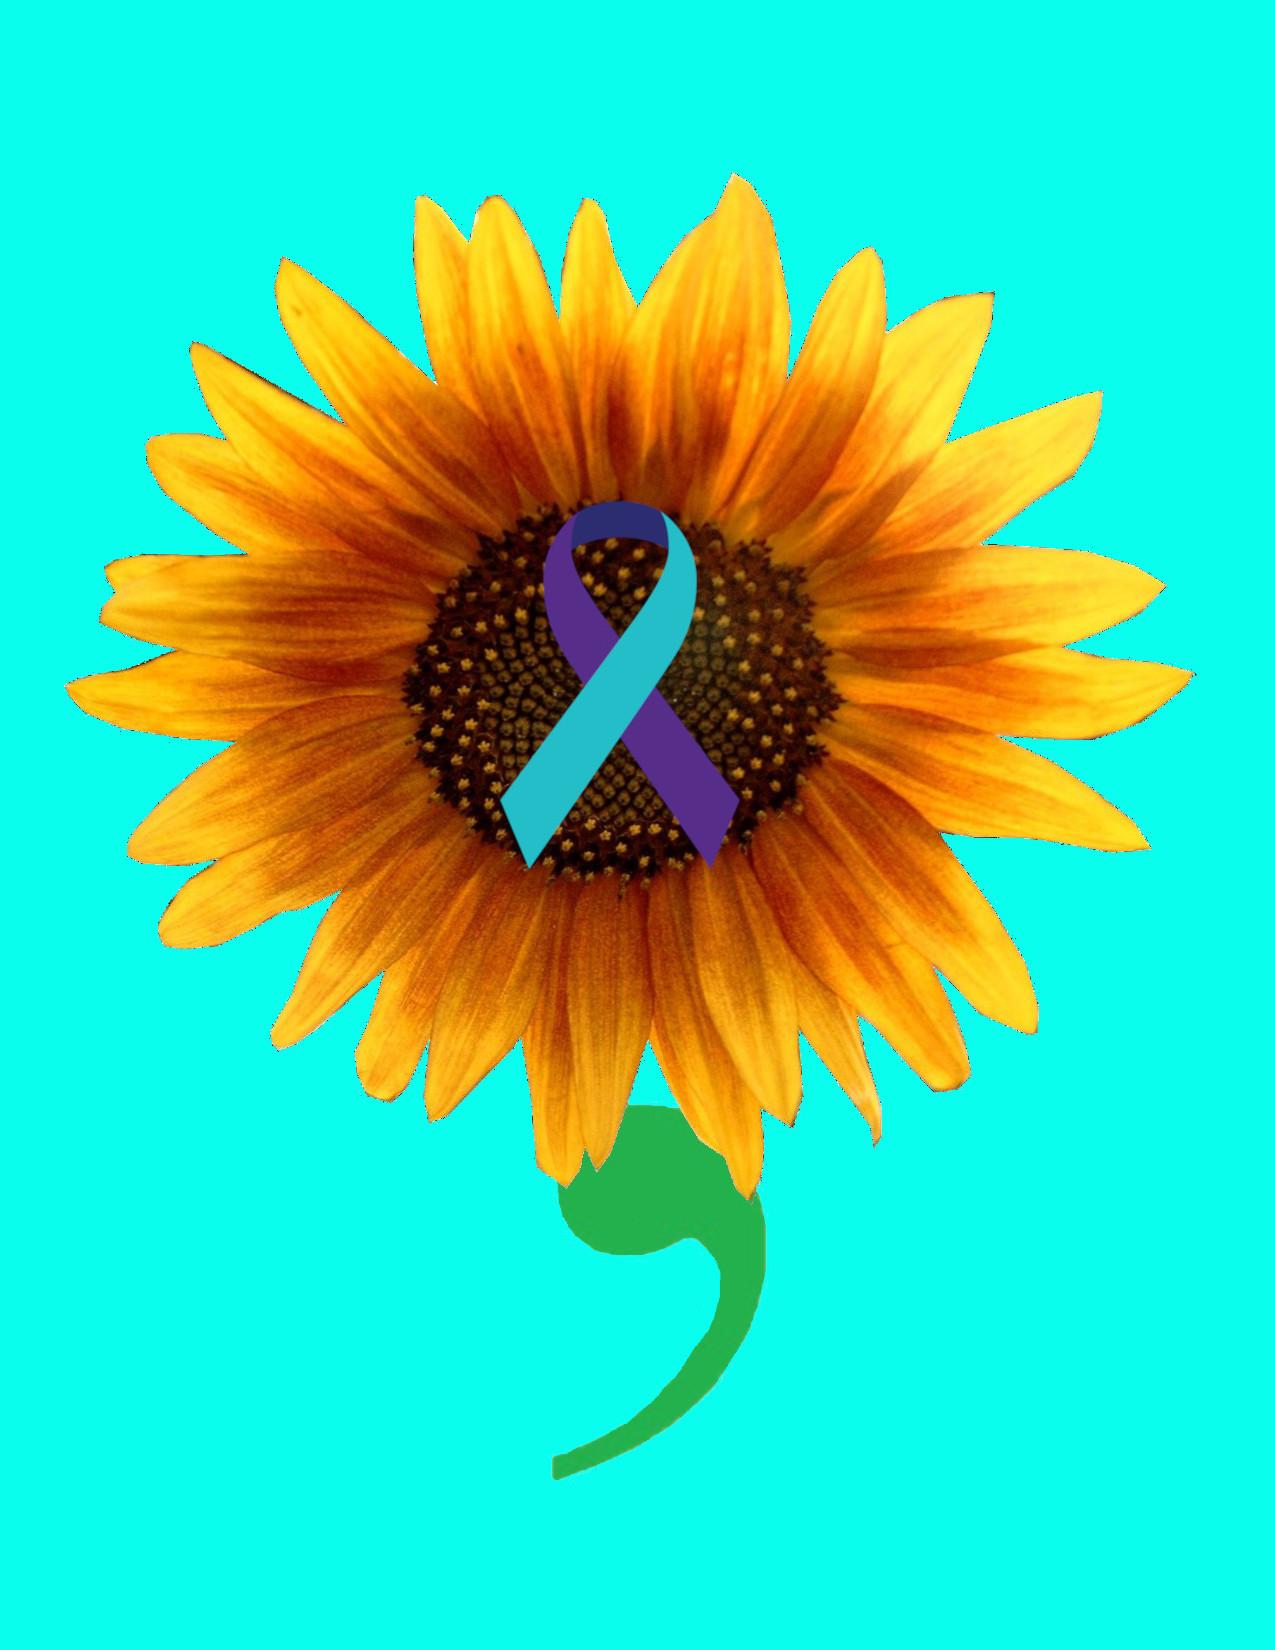 The Sunflower Foundation